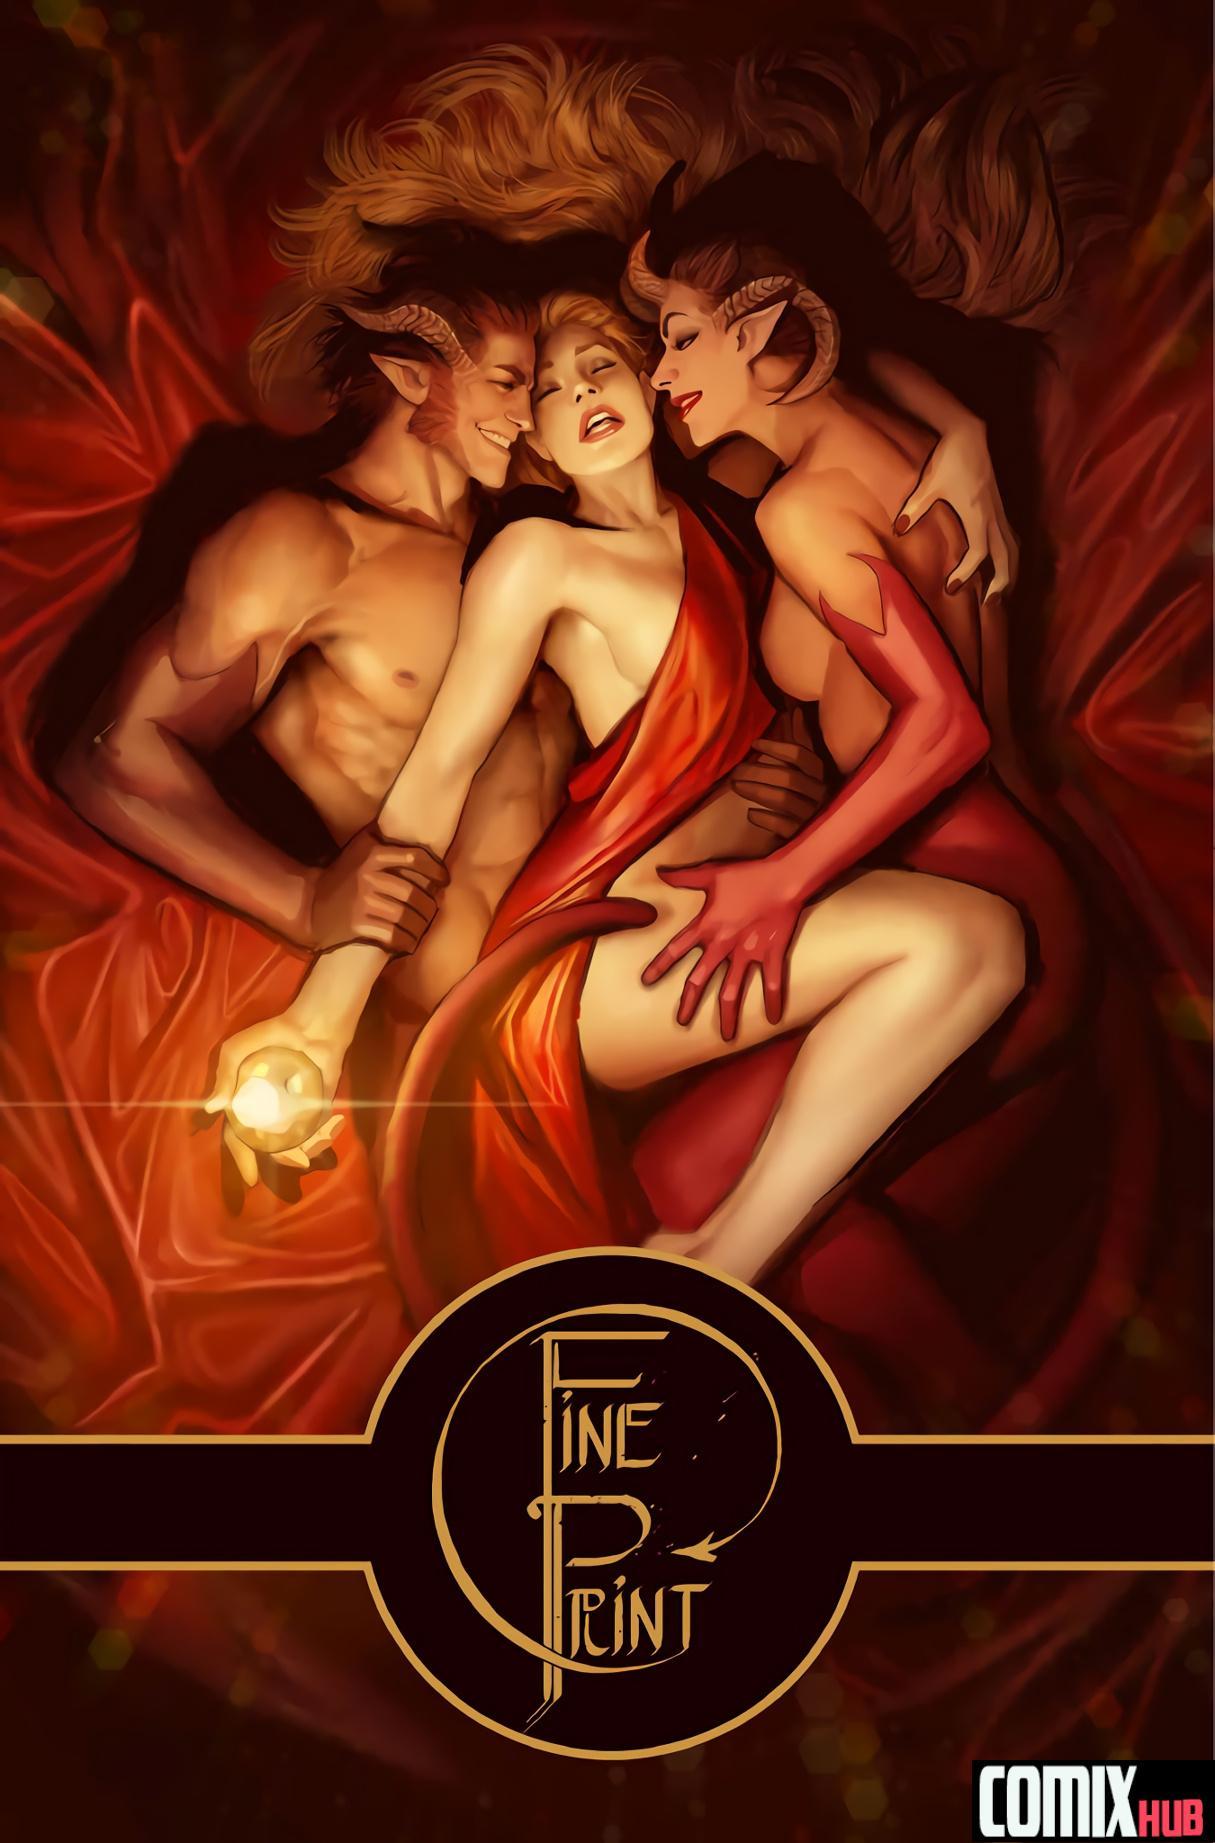 Porn comics, Fine Print Oral sex, Cosplay, cunnilingus, Fantasy, fingering, Gay, Glasses, Group Sex, Lesbians, Masturbation, Monster Girls, Sex and Magic, Threesome